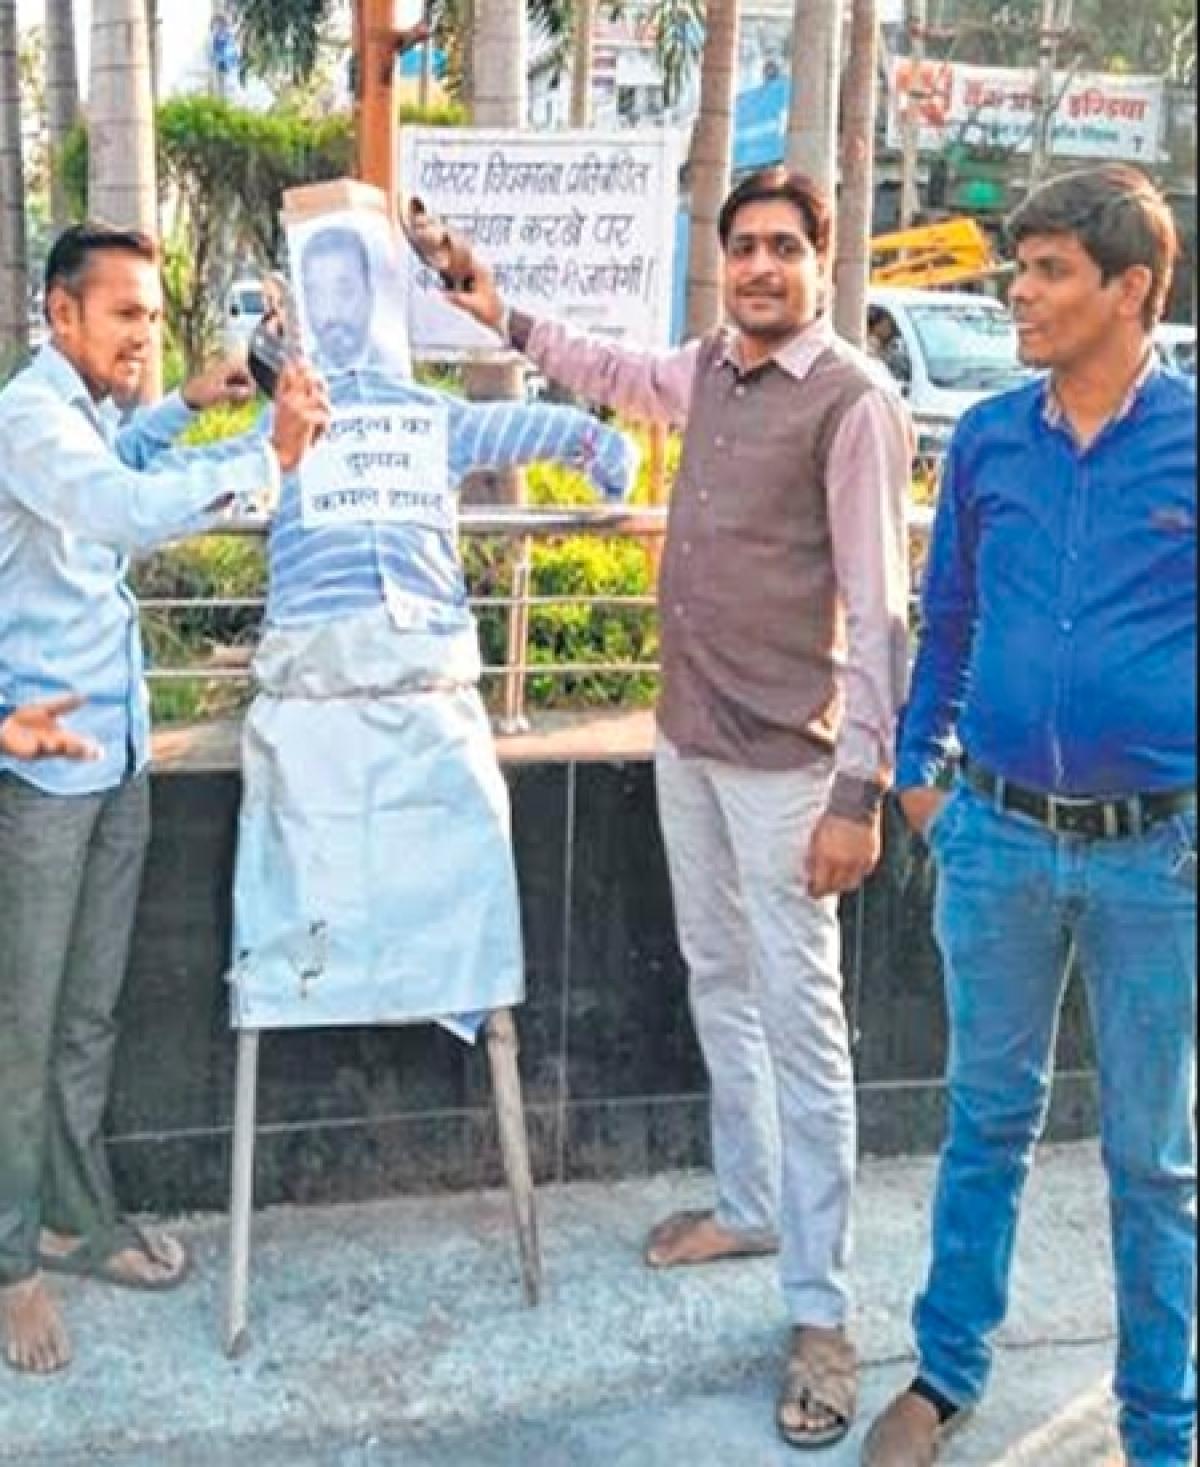 Ujjain: Swarnim Bharat Manch activists burn Kamal Haasan's effigy